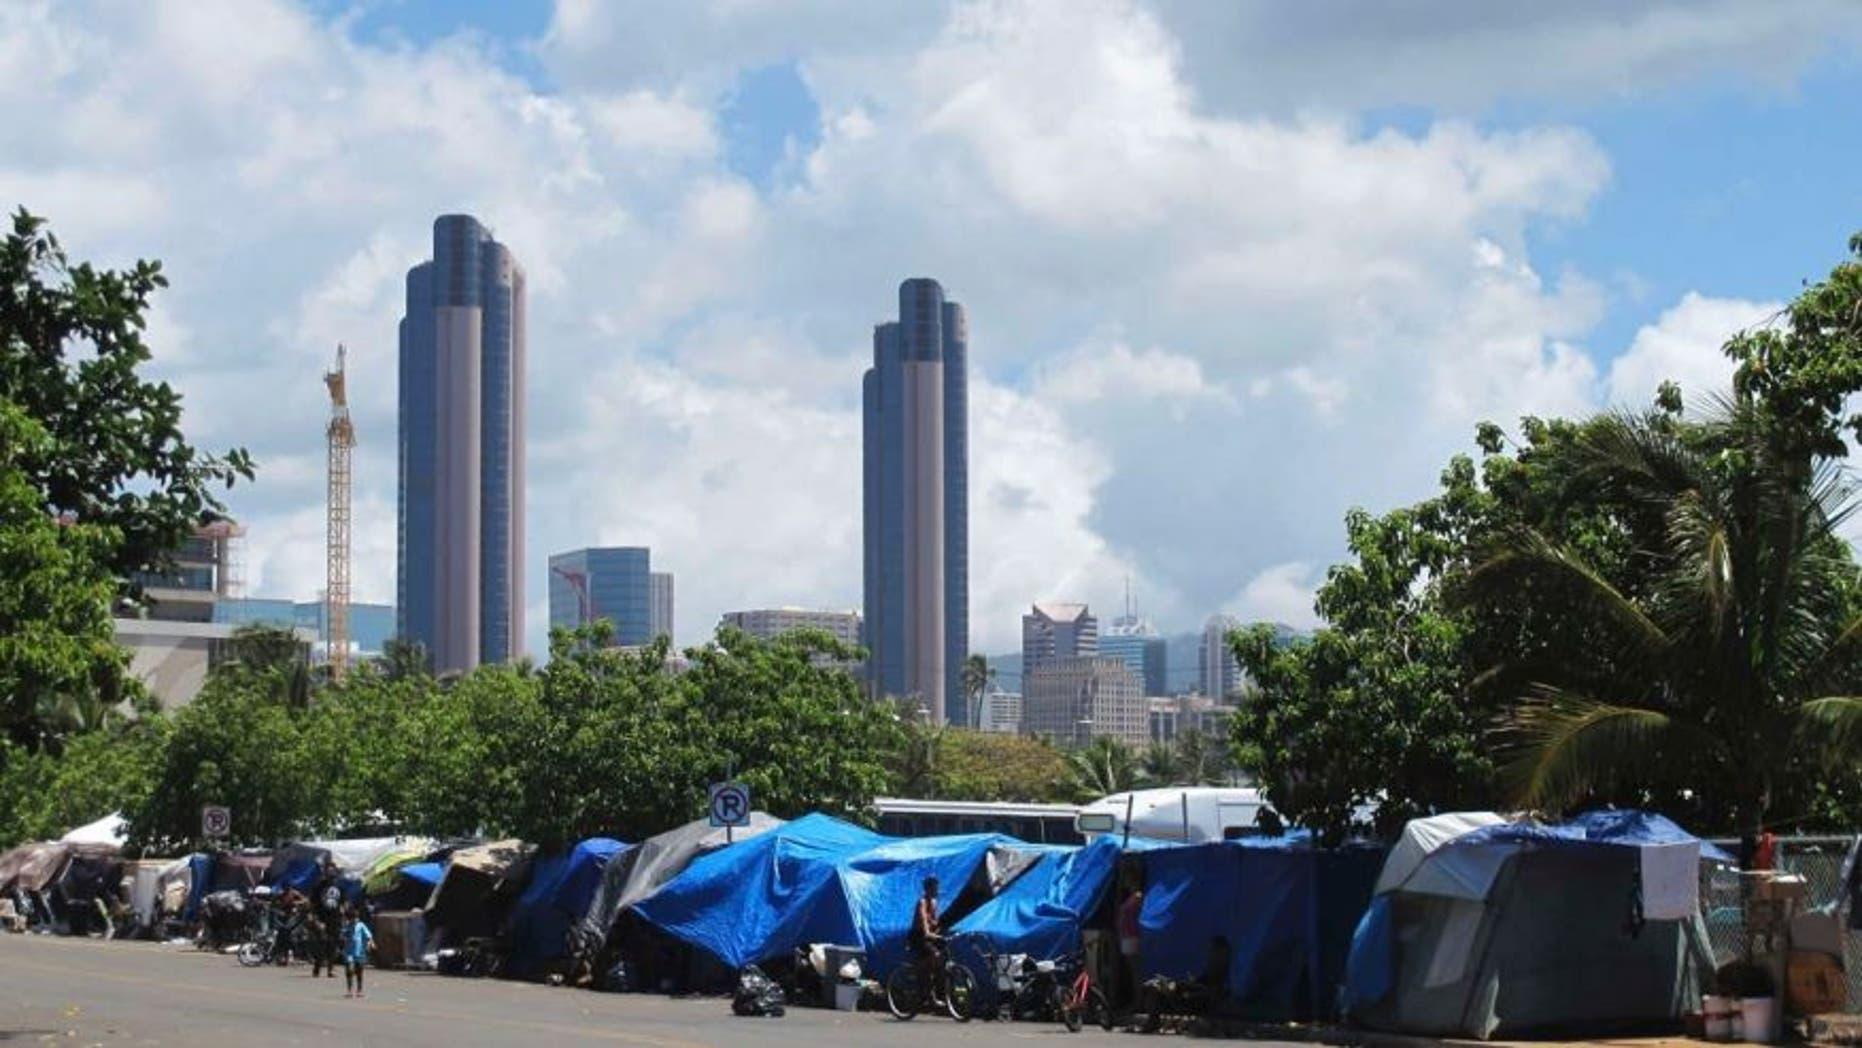 June 30, 2015: People camp out on a sidewalk in the Kakaako neighborhood of Honolulu, Hawaii.